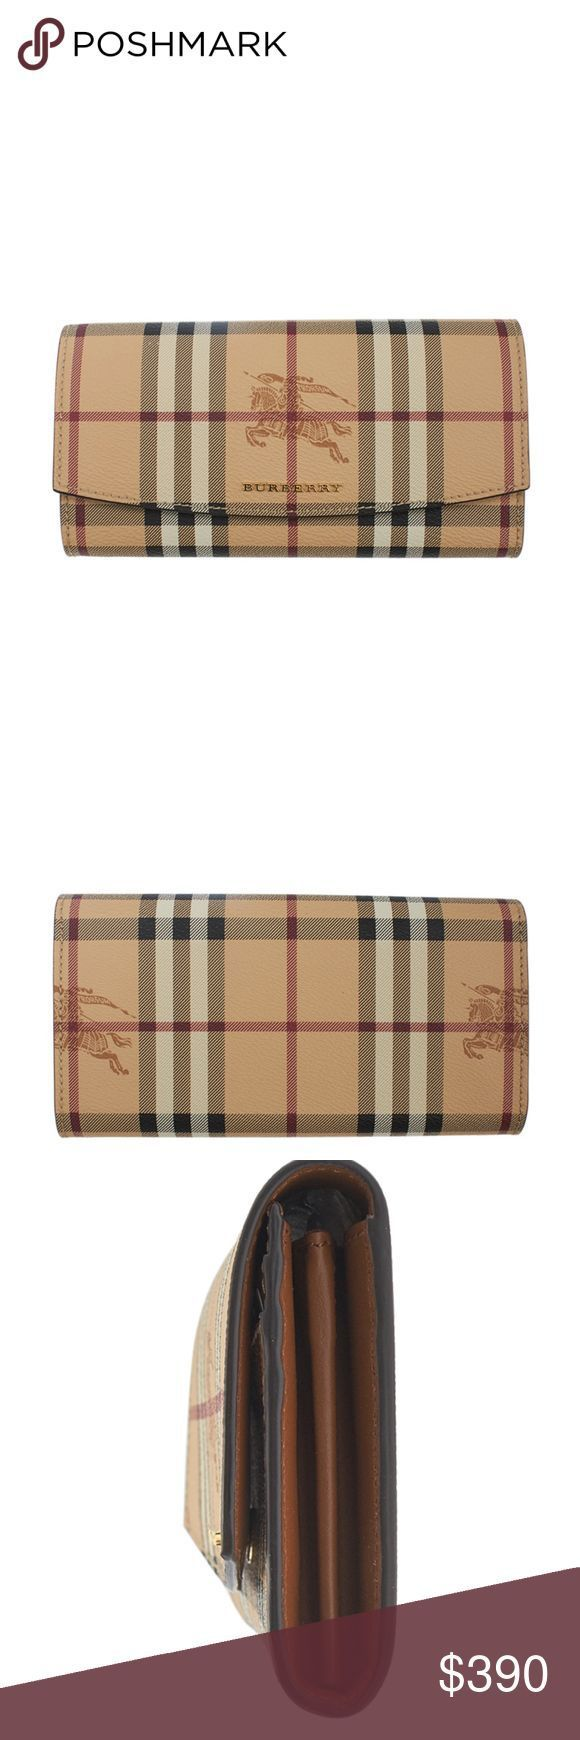 Tendance salopette 2017  Burberry Beige Haymarket Check Wallet 138183 Designer: Burberry Overall Co